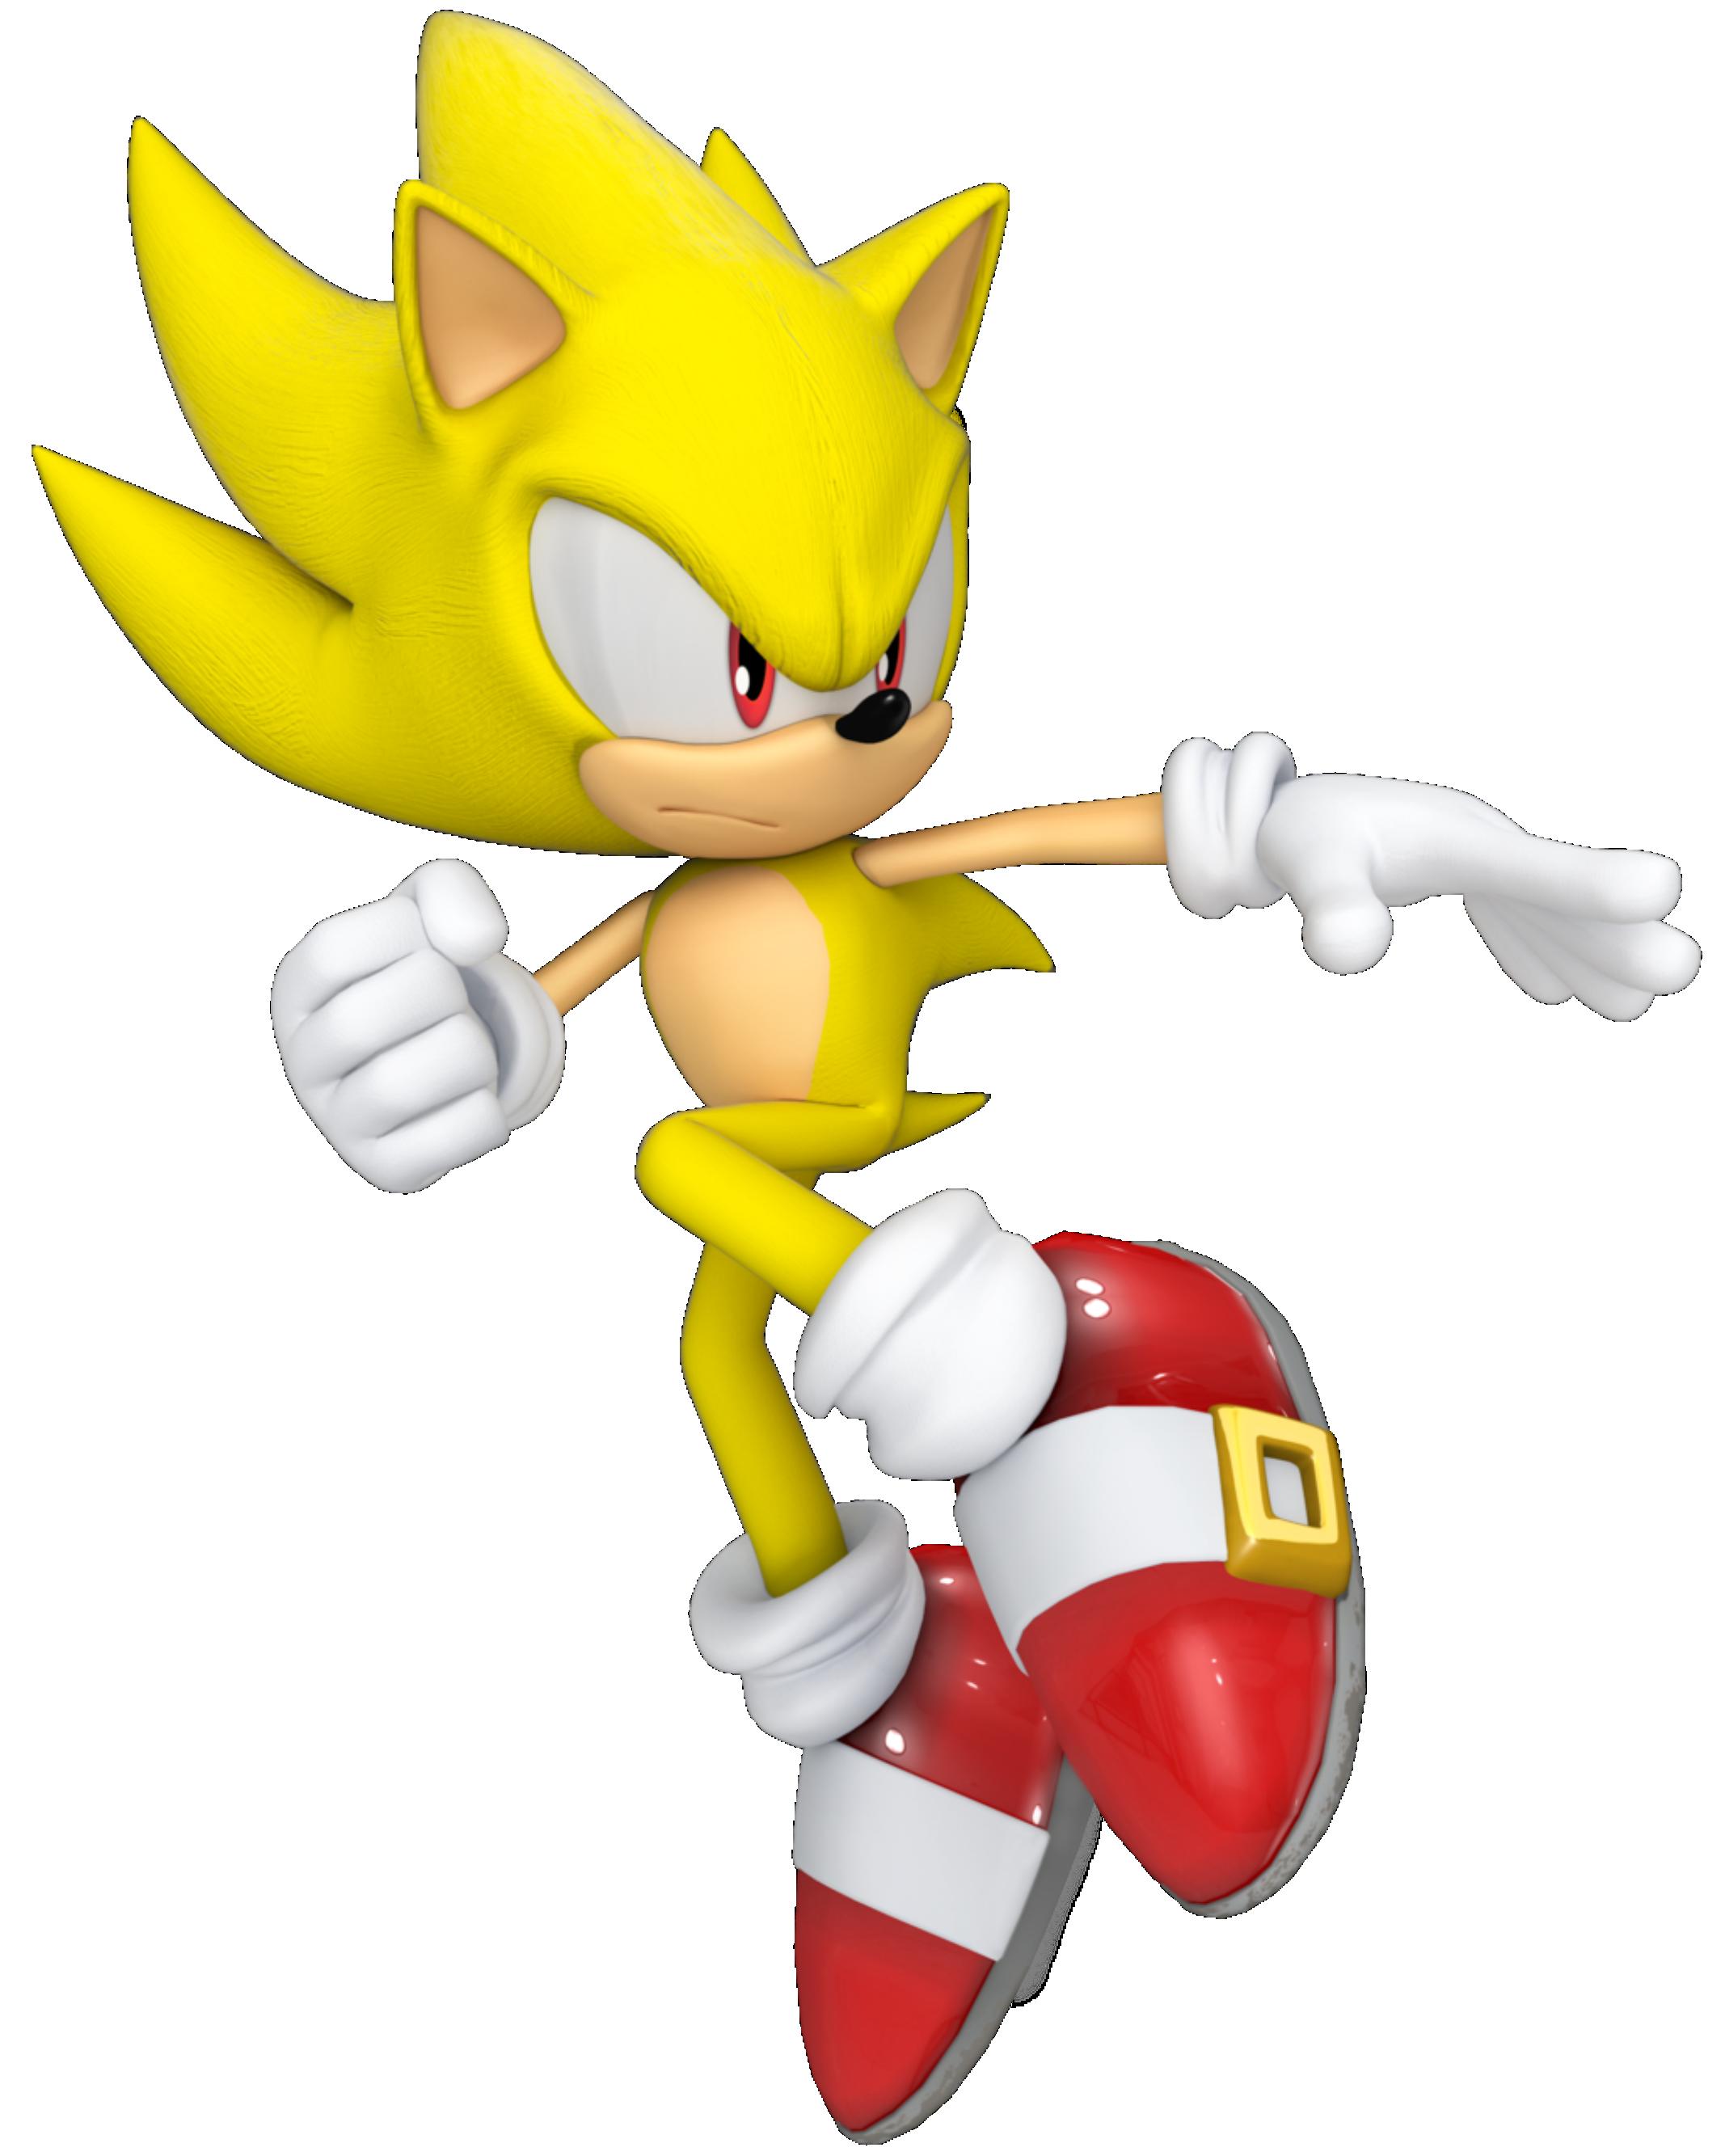 Sonic Sonic Amarelo 16 Png Imagens E Moldes Com Br